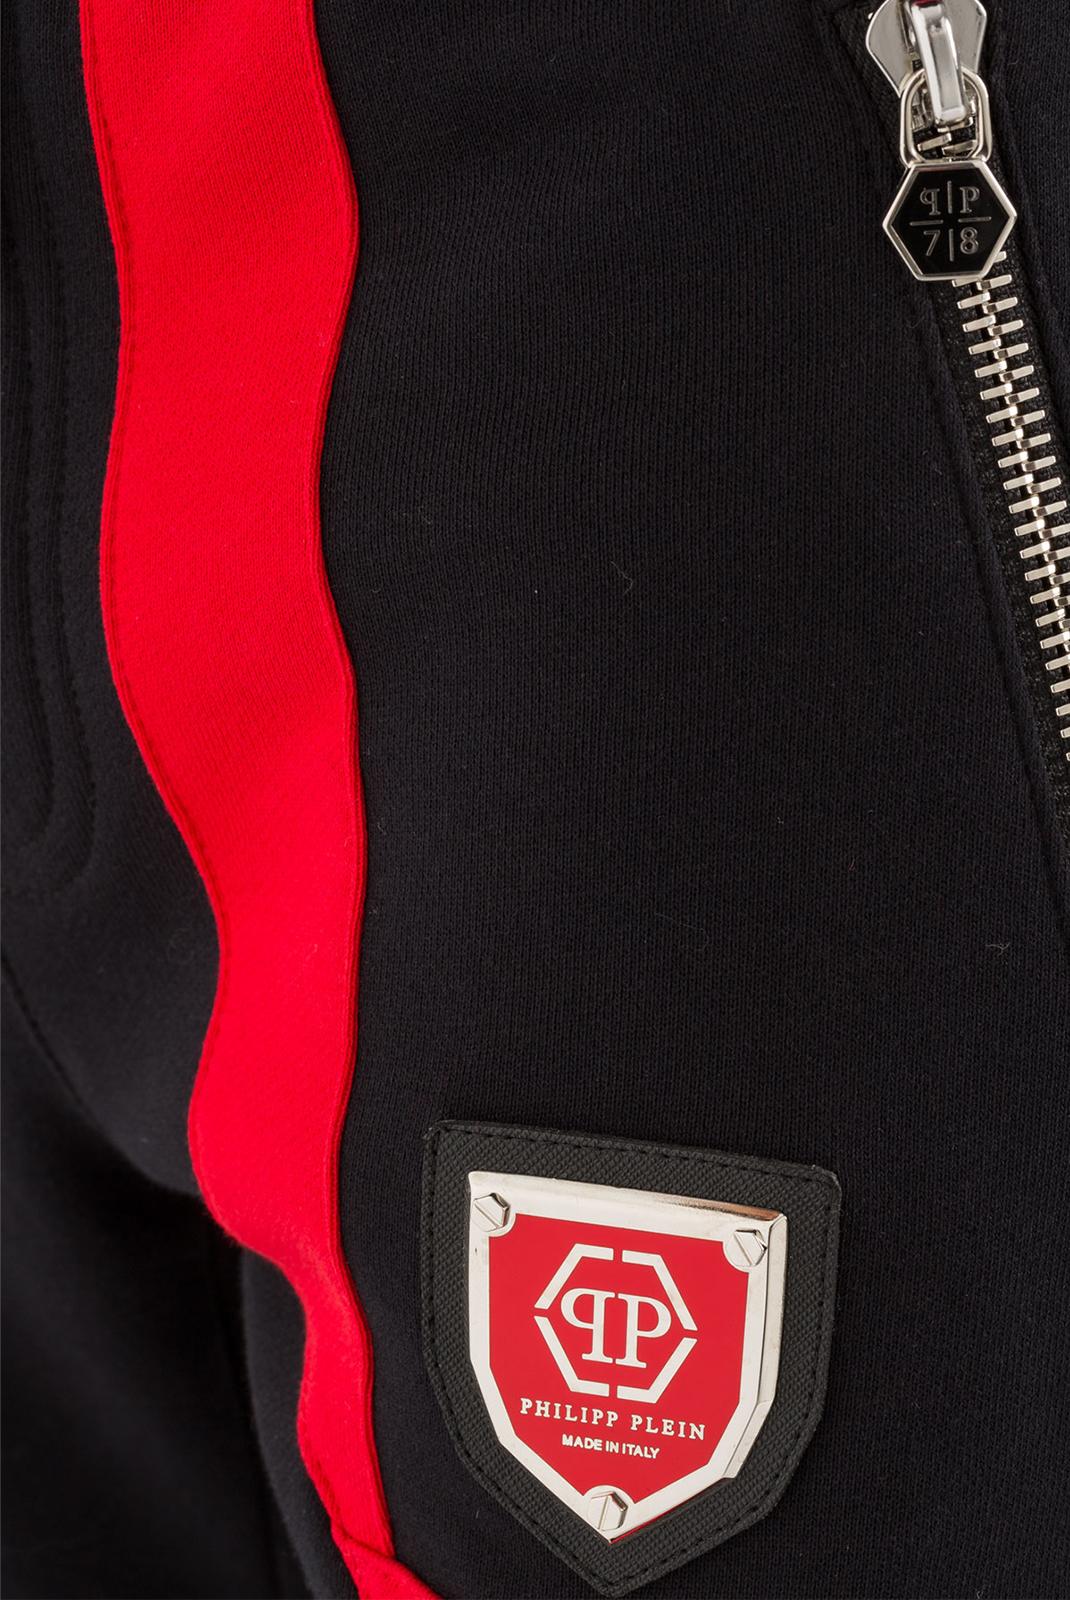 Pantalons  Philipp plein MJT0049 SO TWO 02R4 BLACK/RED